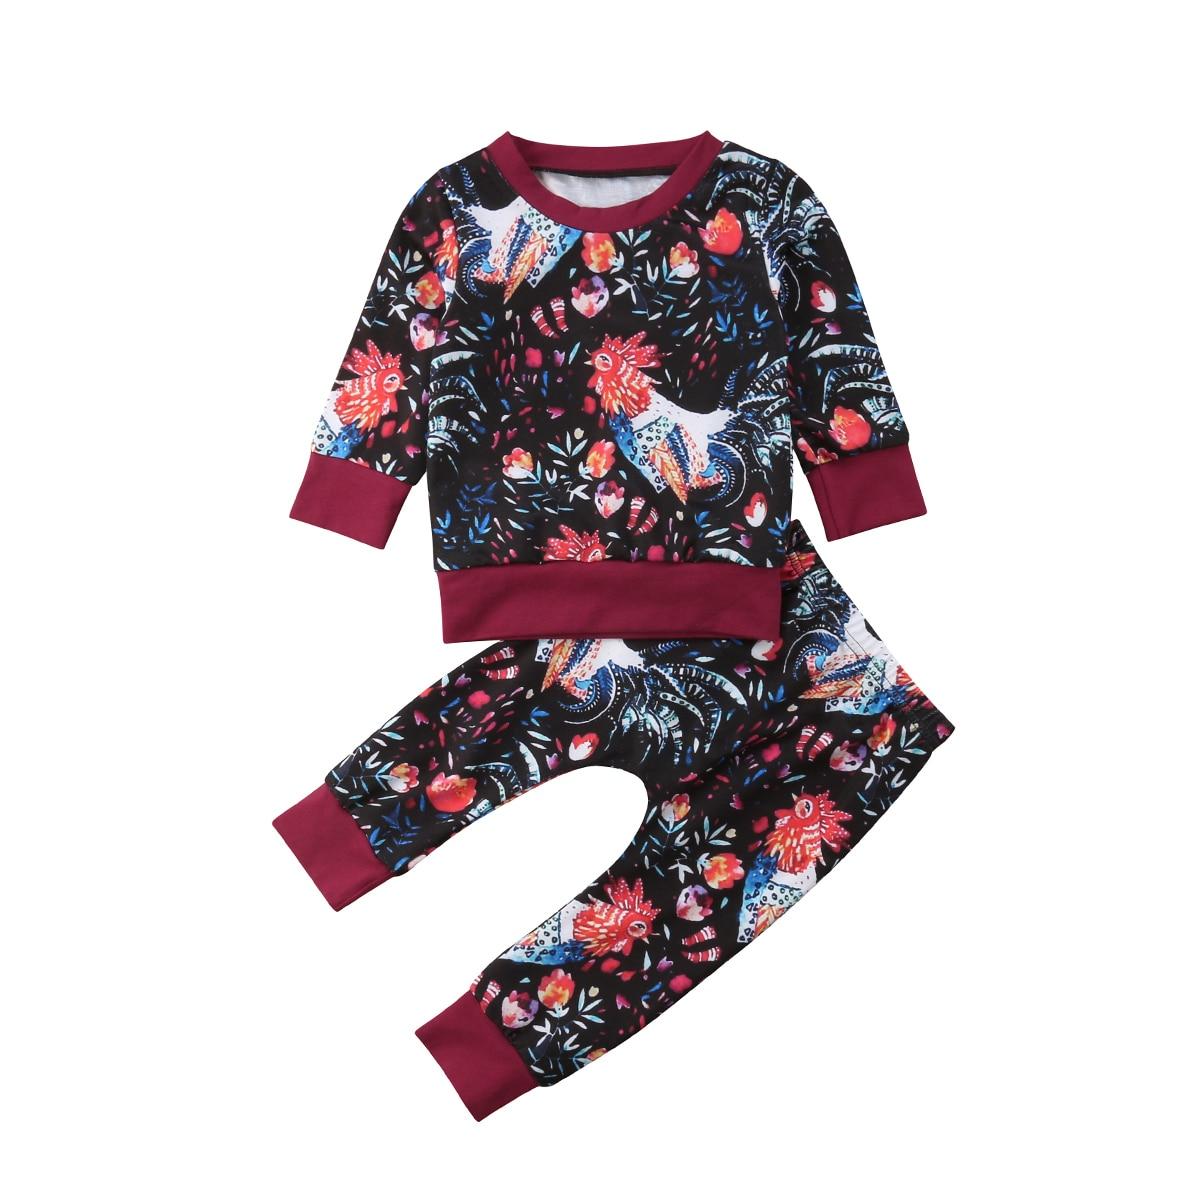 6c8f20e53ba9 Autumn winter spring 2PCS Kids Baby Girl clothes set print Floral Top T- shirt pullover